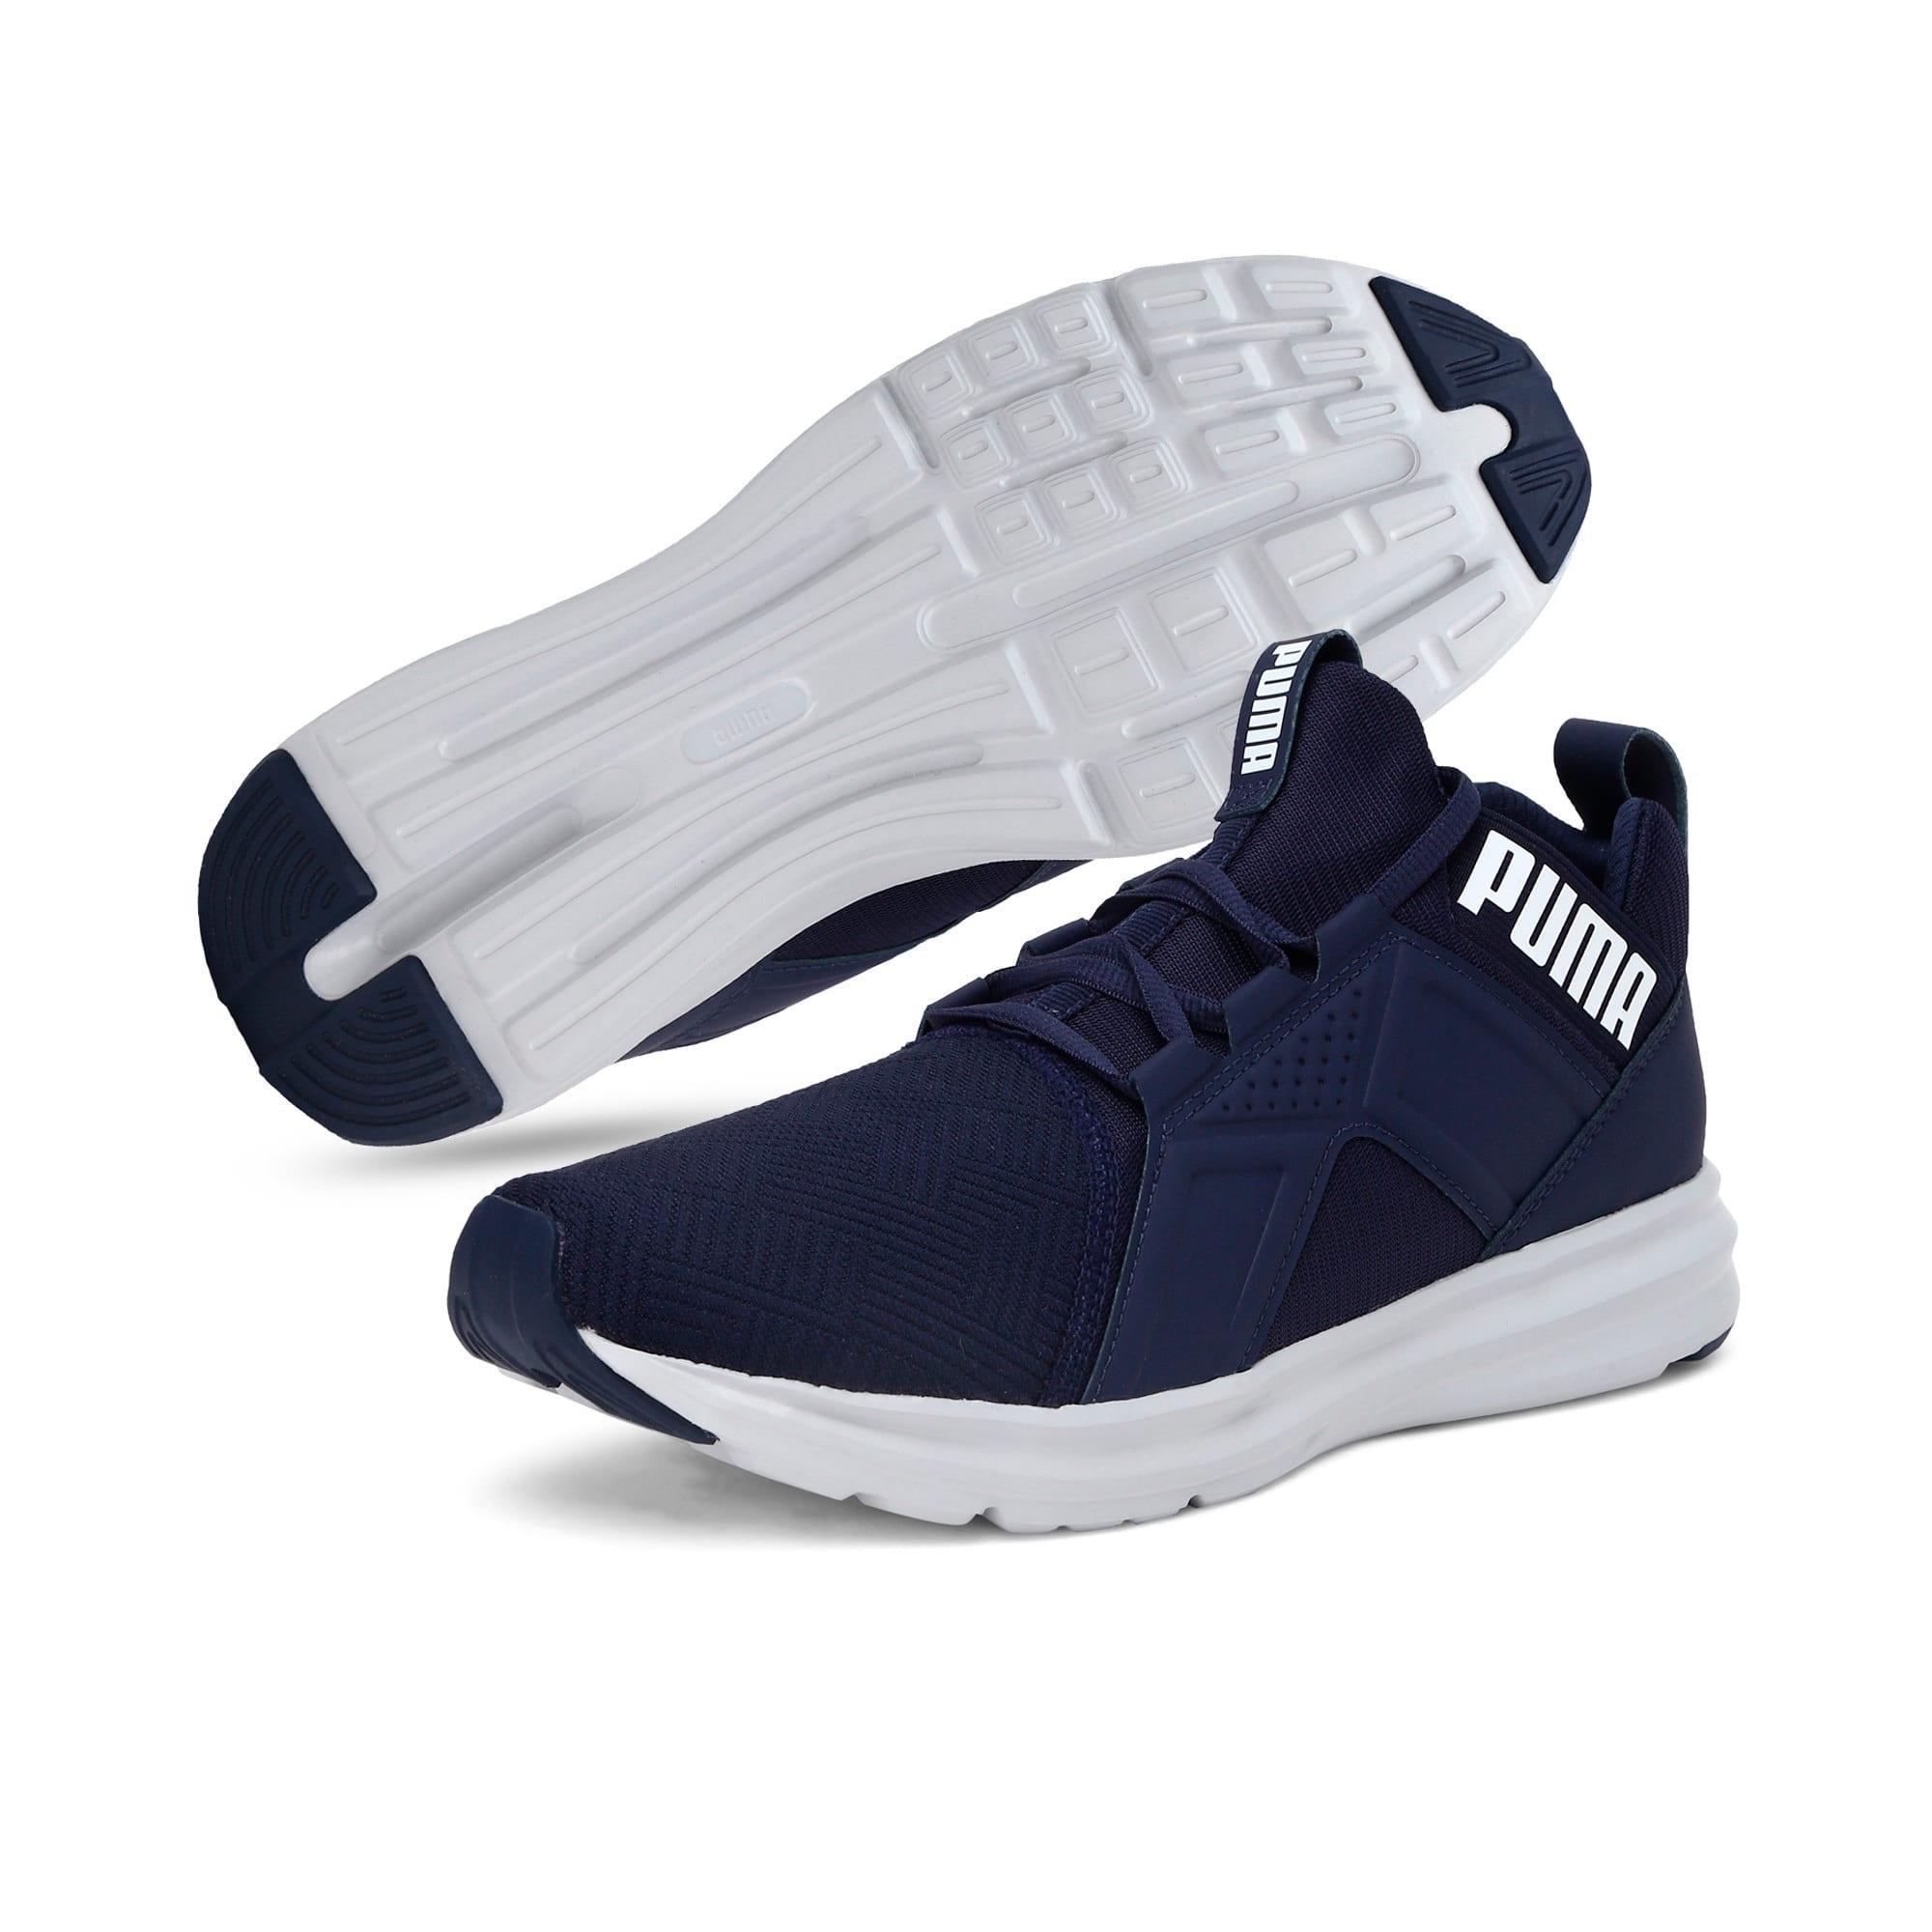 Thumbnail 2 of Enzo Geo Men's Running Shoes, Peacoat, medium-IND